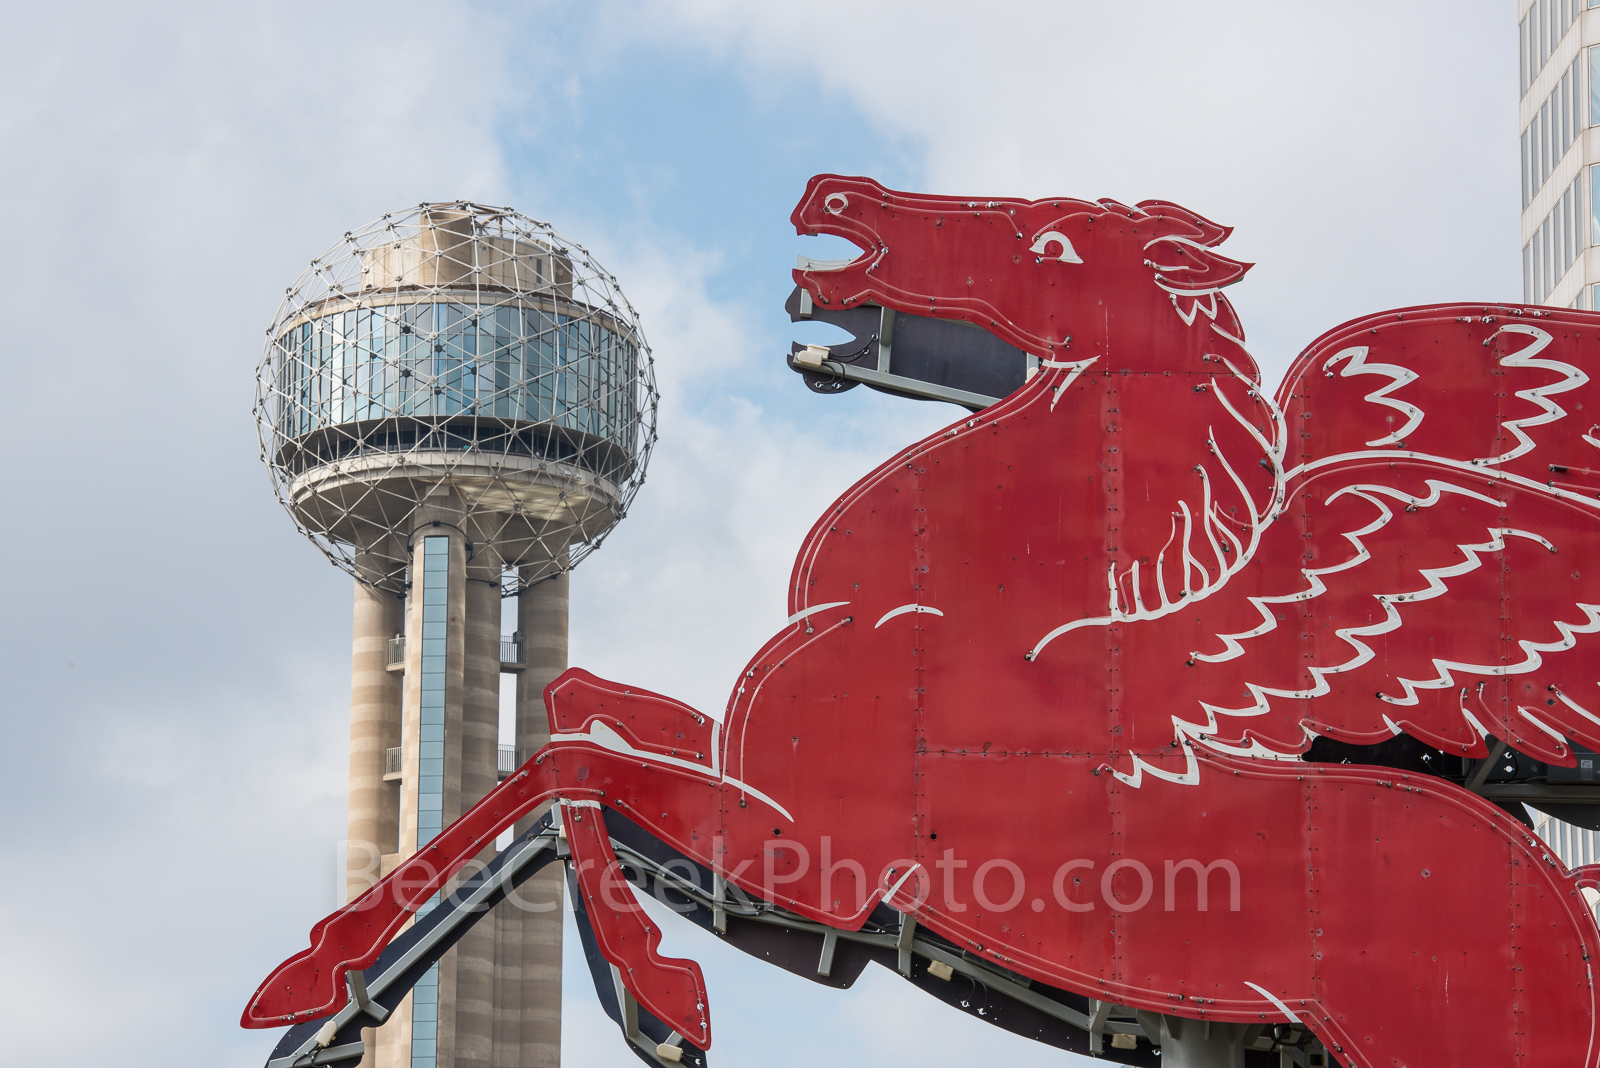 Dallas Pegasus and Reunion Tower, downtown, city, landmarks, daytime, Dallas stock photos, day, , photo